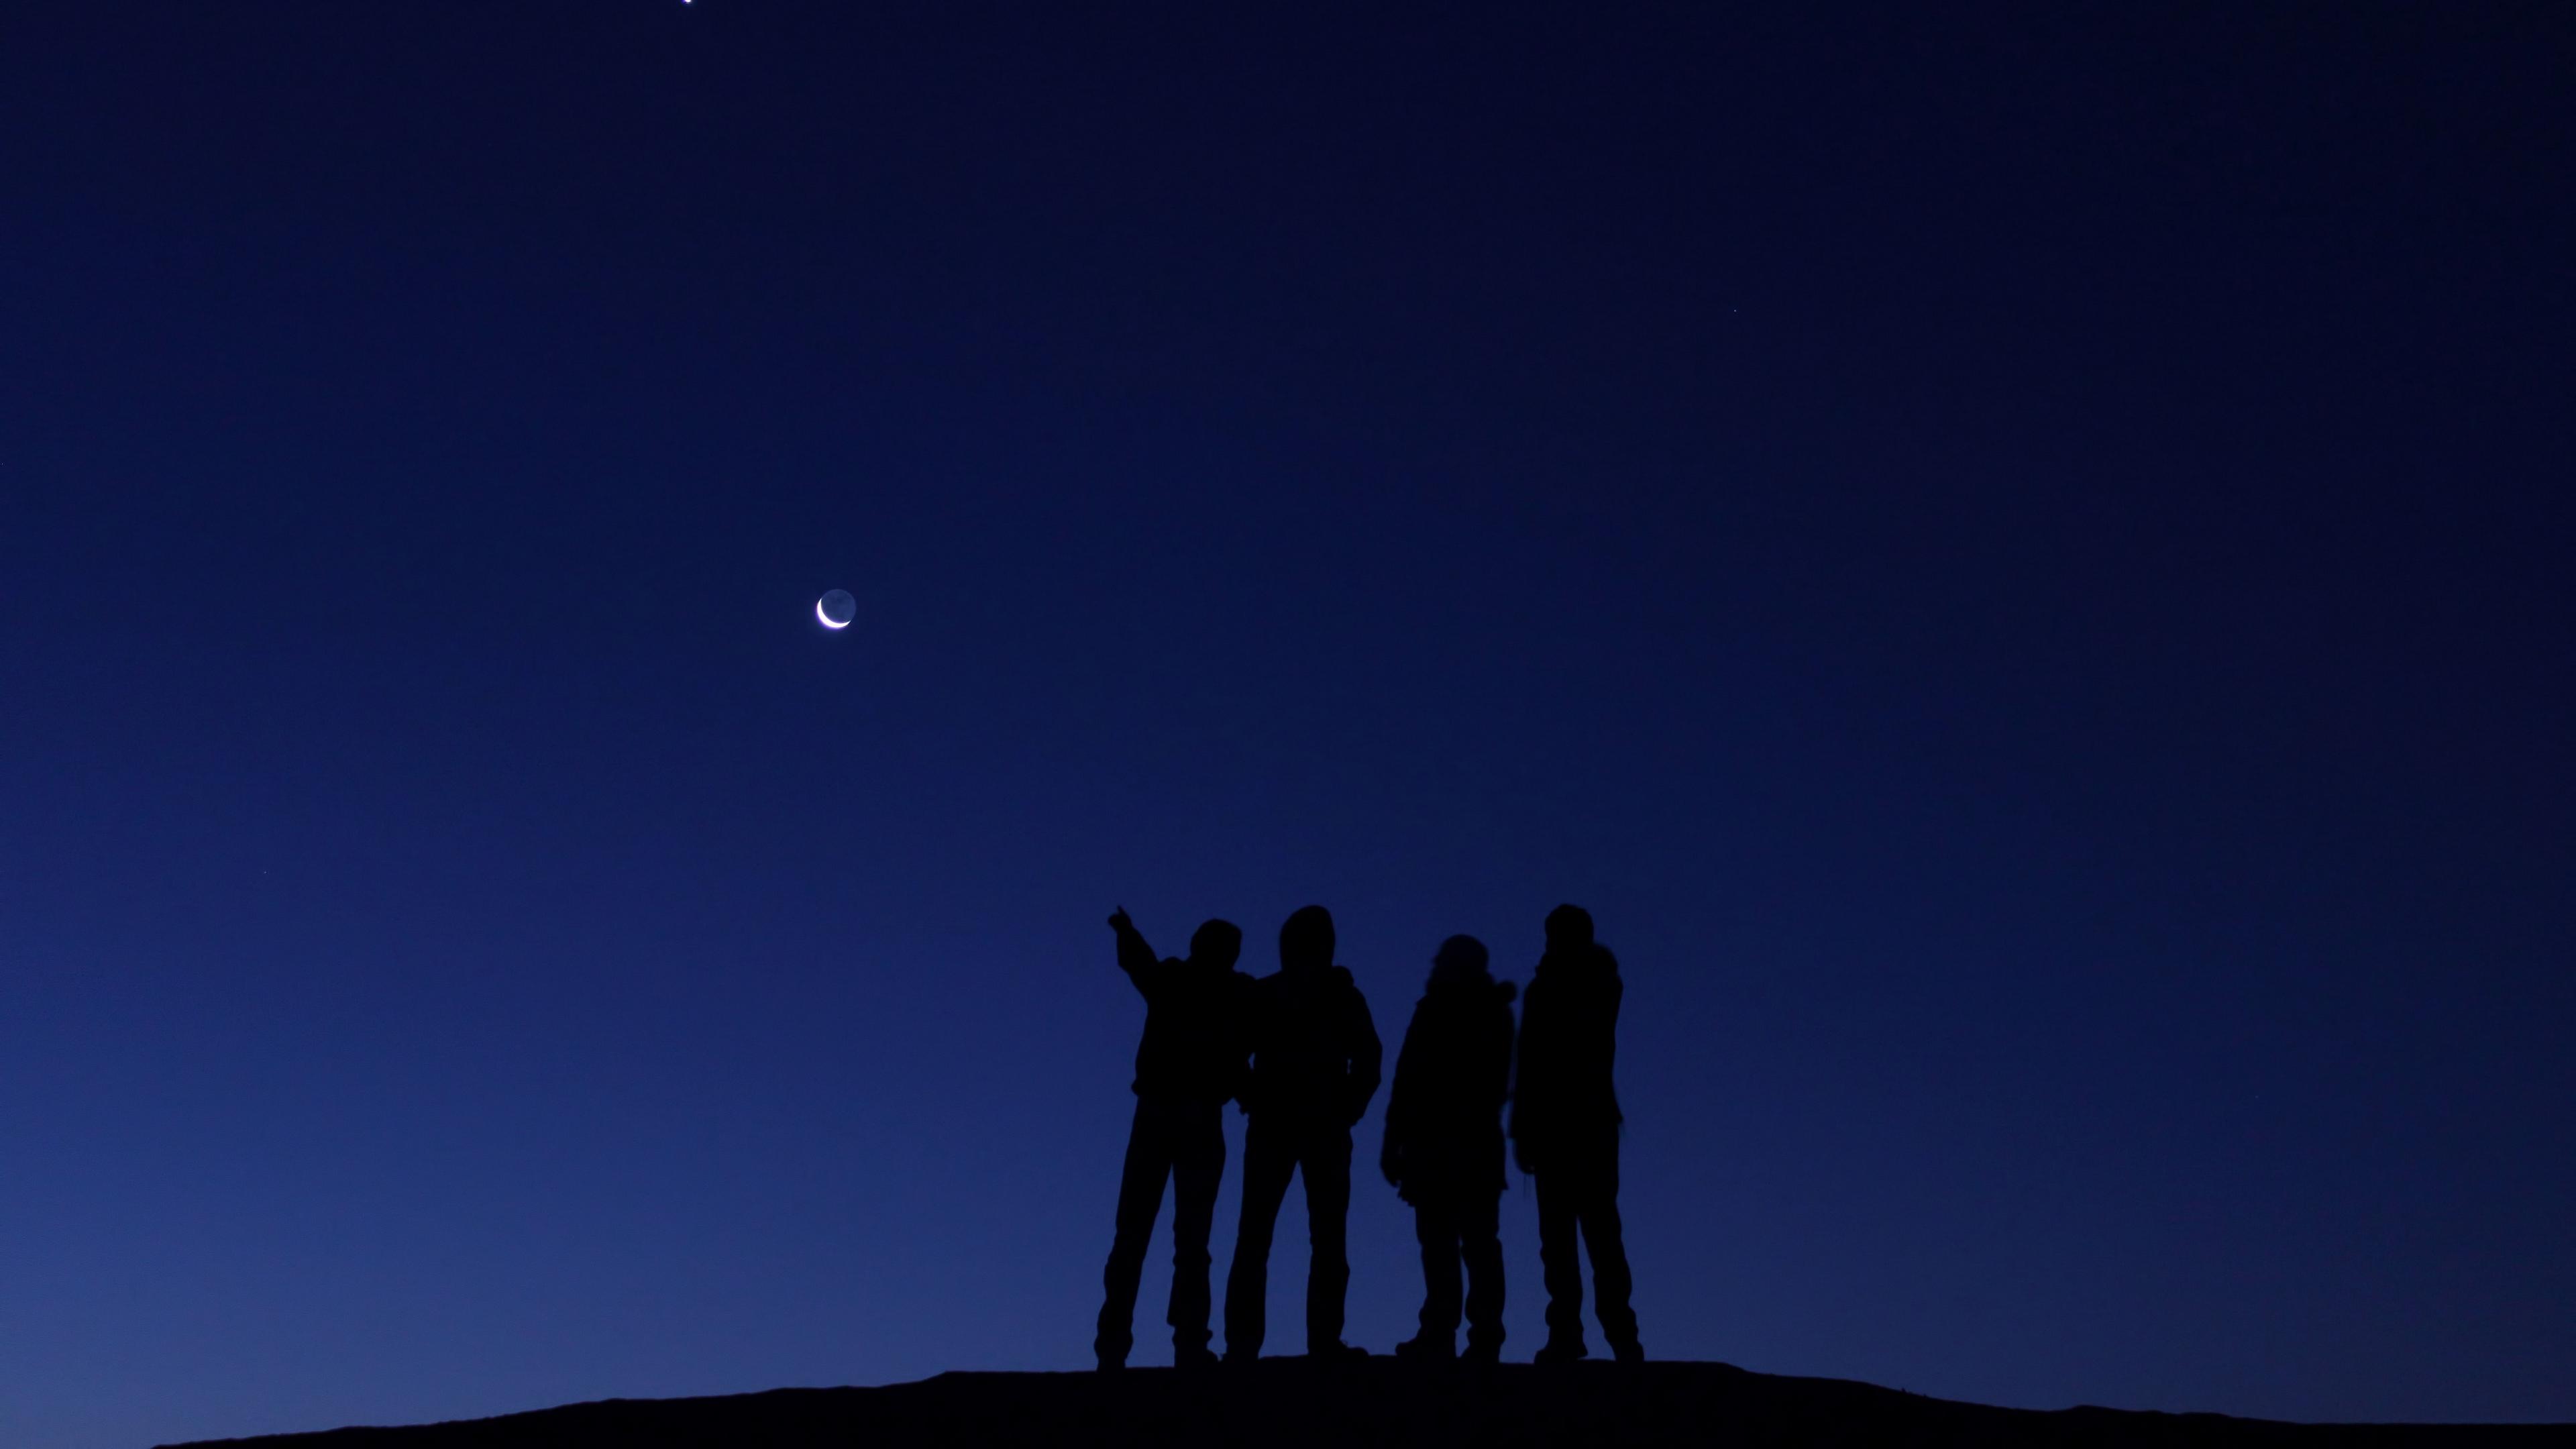 space people venus moon 4k 1536017749 - space, people, venus, moon 4k - venus, Space, People